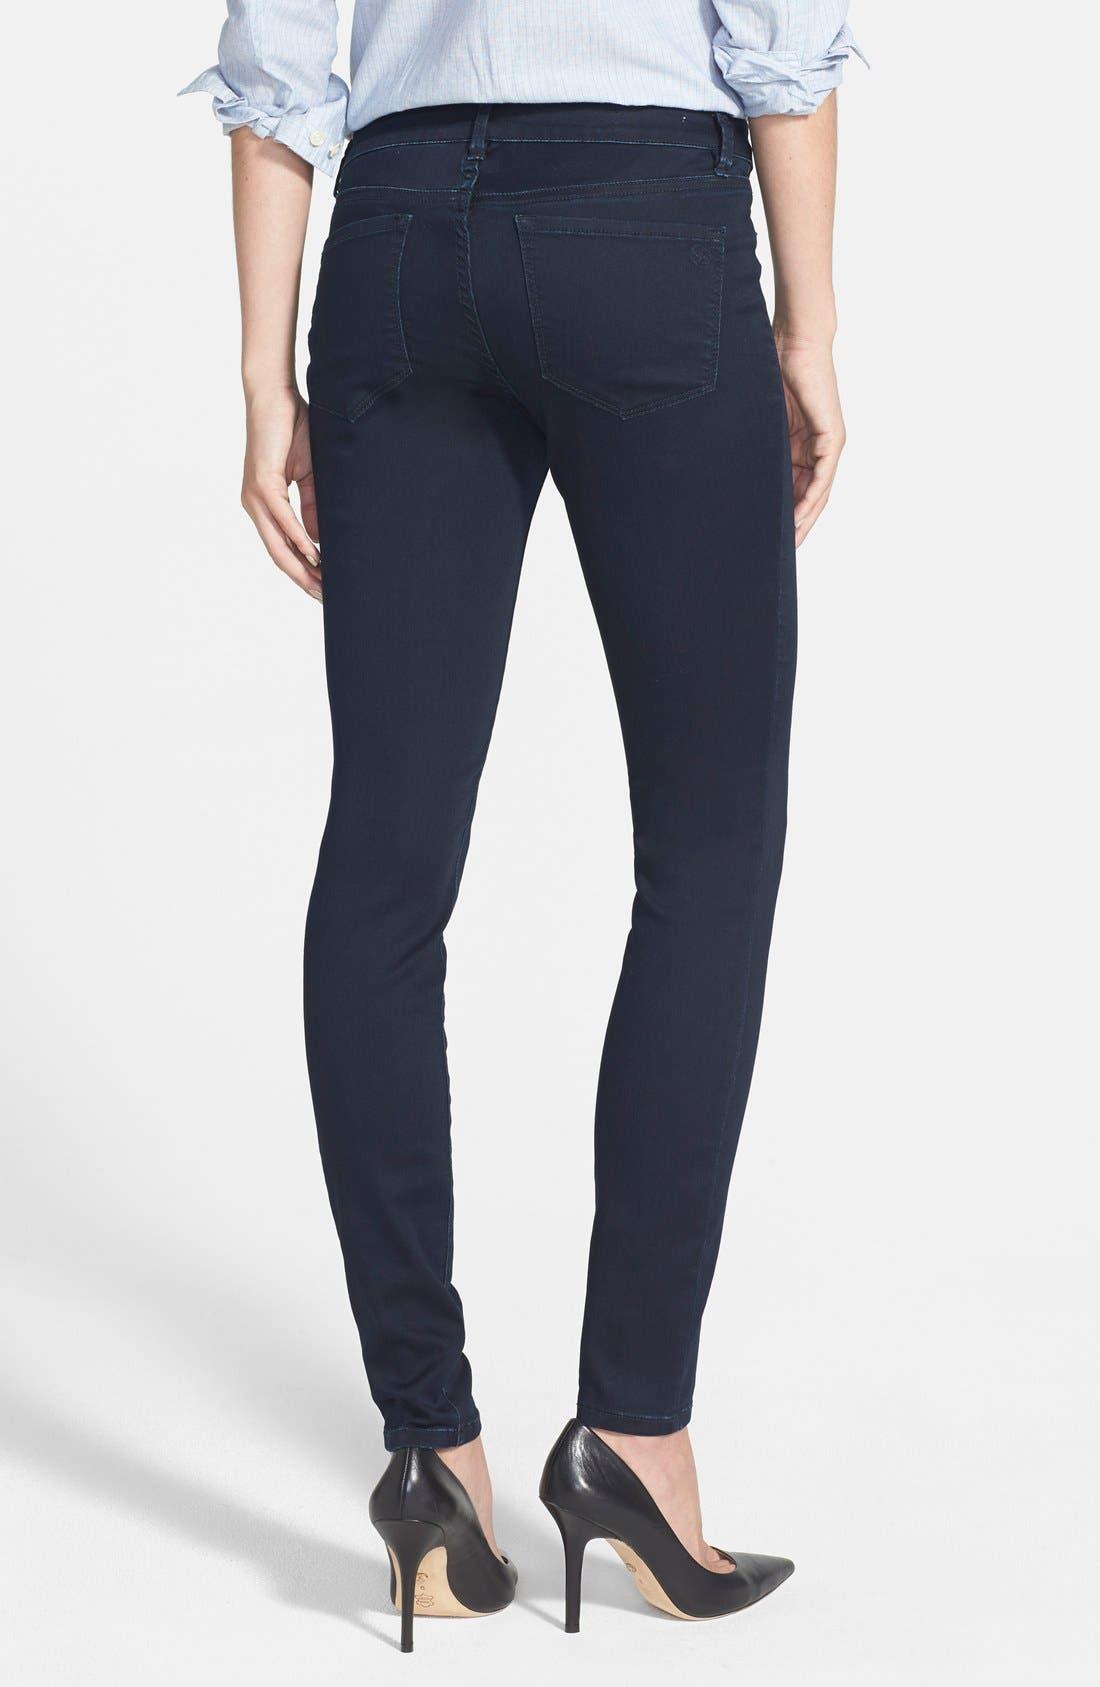 Alternate Image 2  - Jessica Simpson 'Kiss Me' Super Skinny Jeans (Enzyme Rinse)